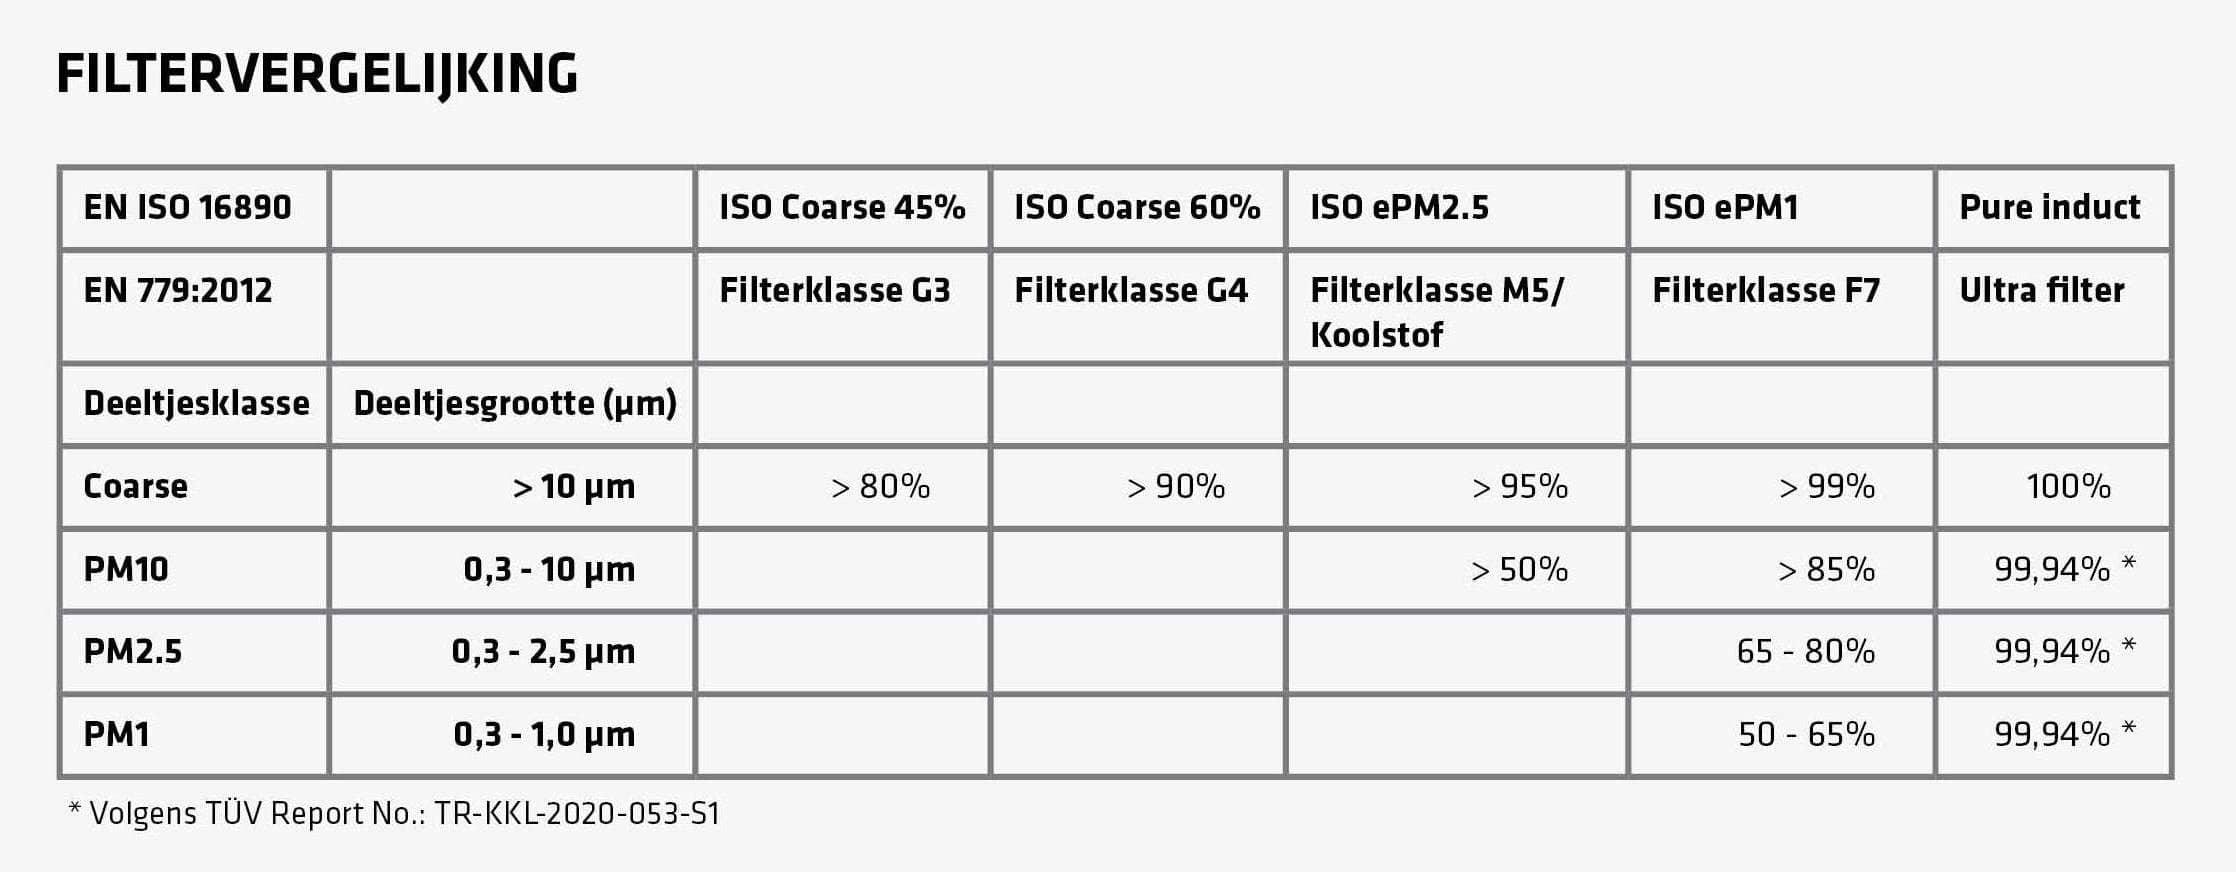 https://www.brinkclimatesystems.nl/storage/Nieuws/2020/Filtervergelijking-NL-v3.jpg